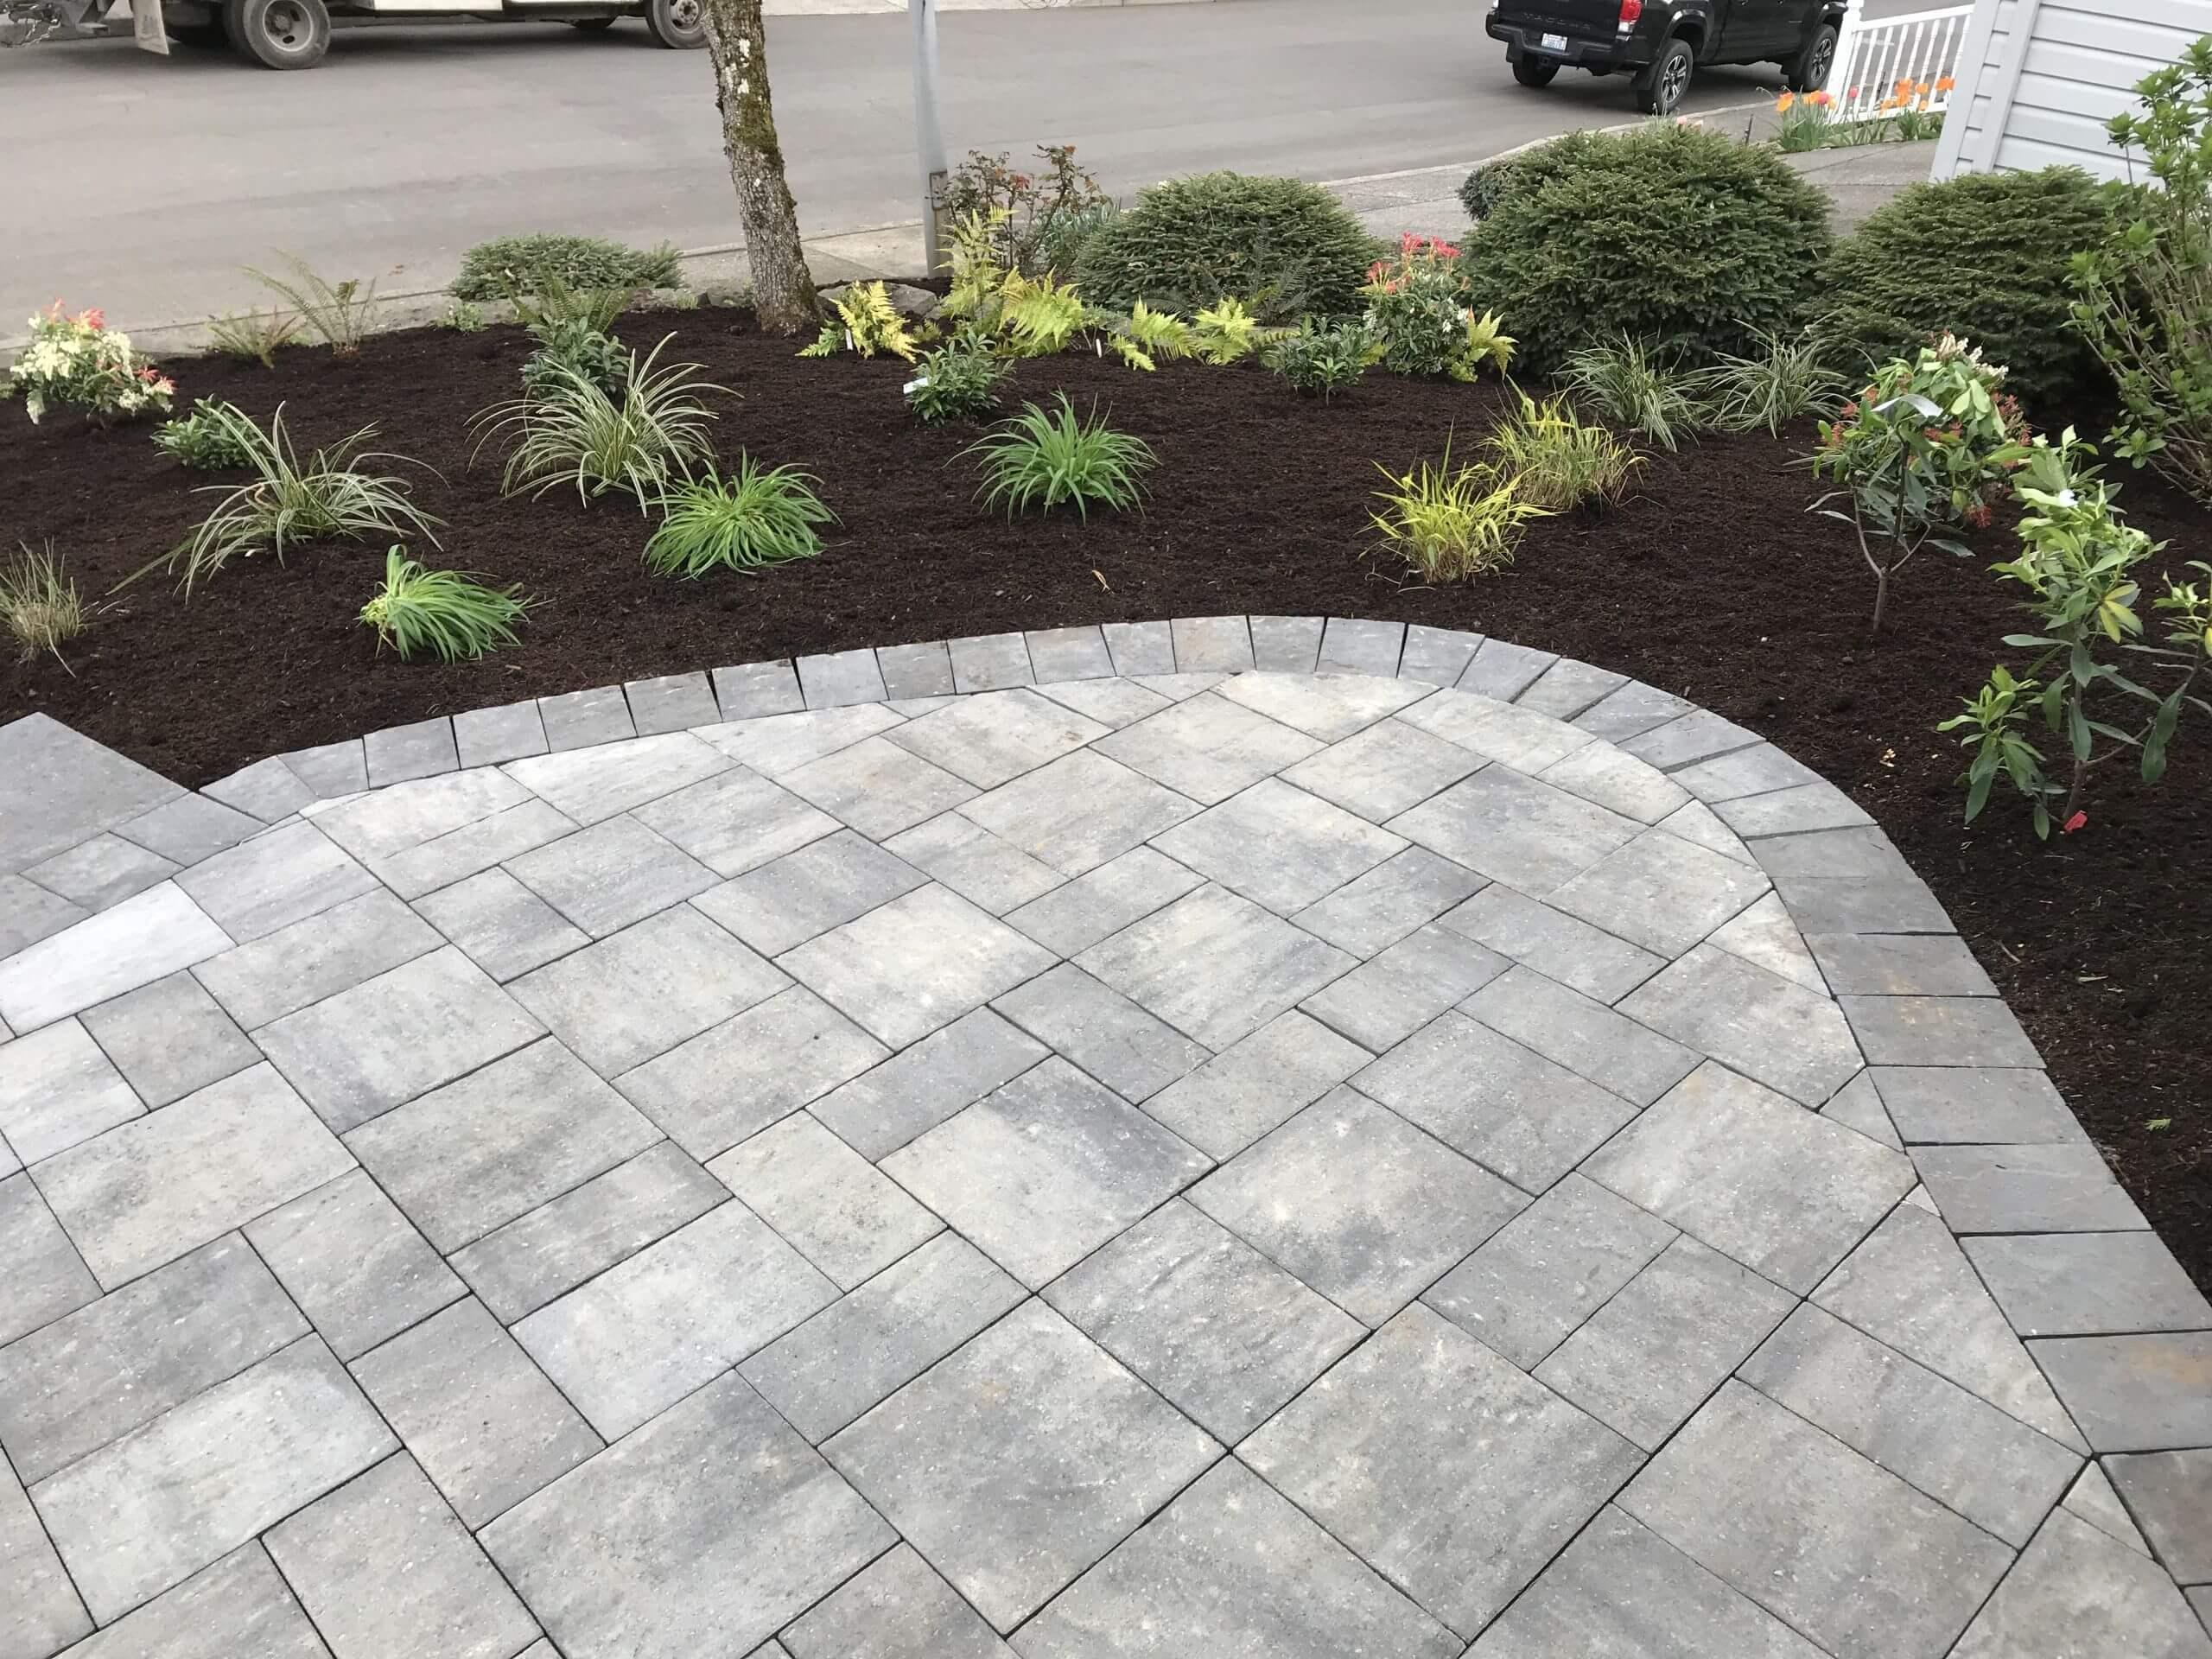 https://shovelandthumb.sfo3.digitaloceanspaces.com/patios walkways/patio 8